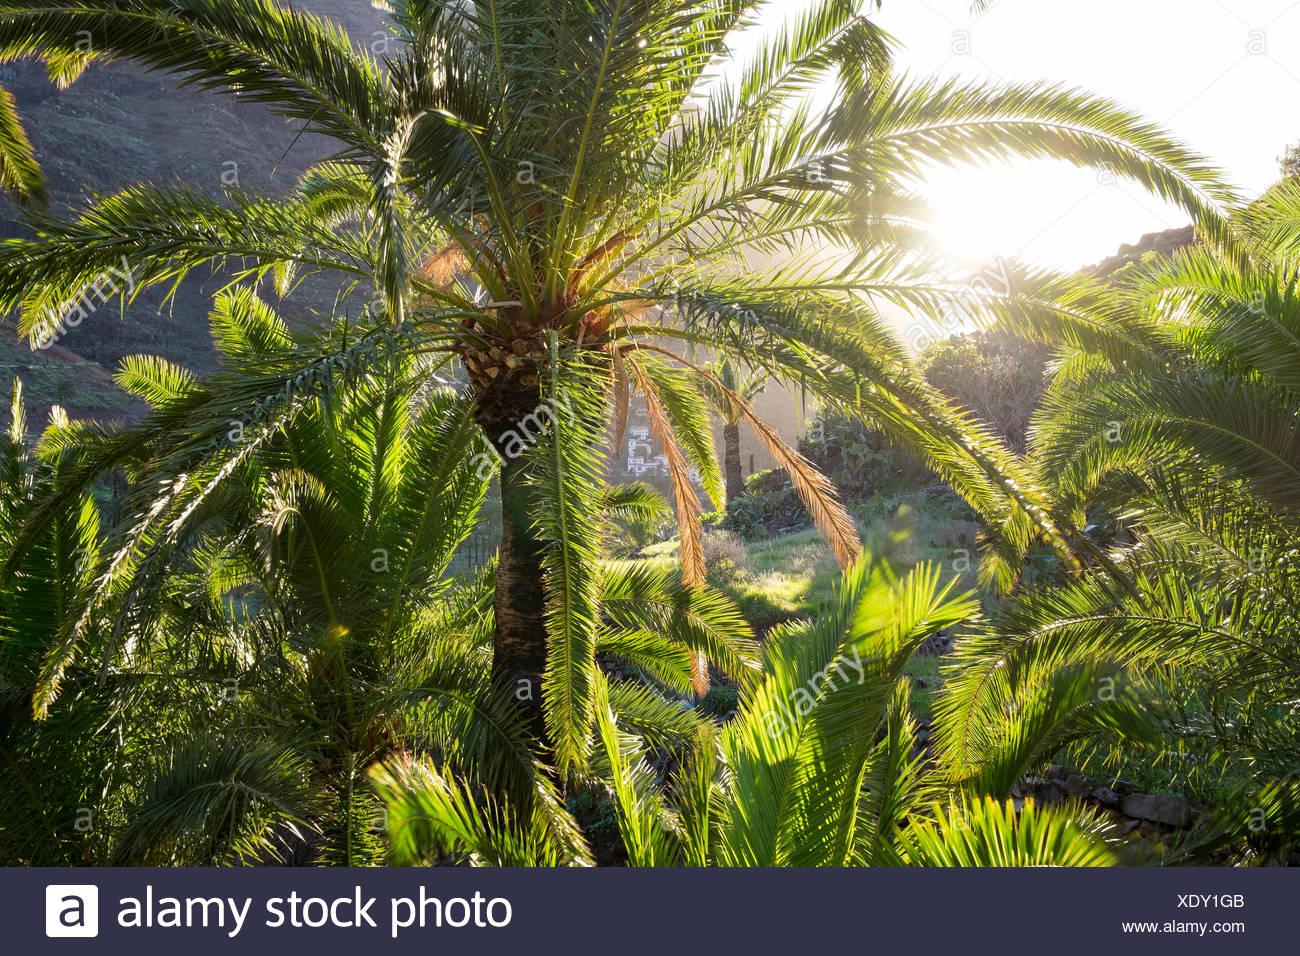 Kanarische IsRMand Datum PaRMm (Phoenix Canariensis), VaRMRMe Gran Rey, RMa Gomera, Kanarische IsRMands, Spanien Stockbild